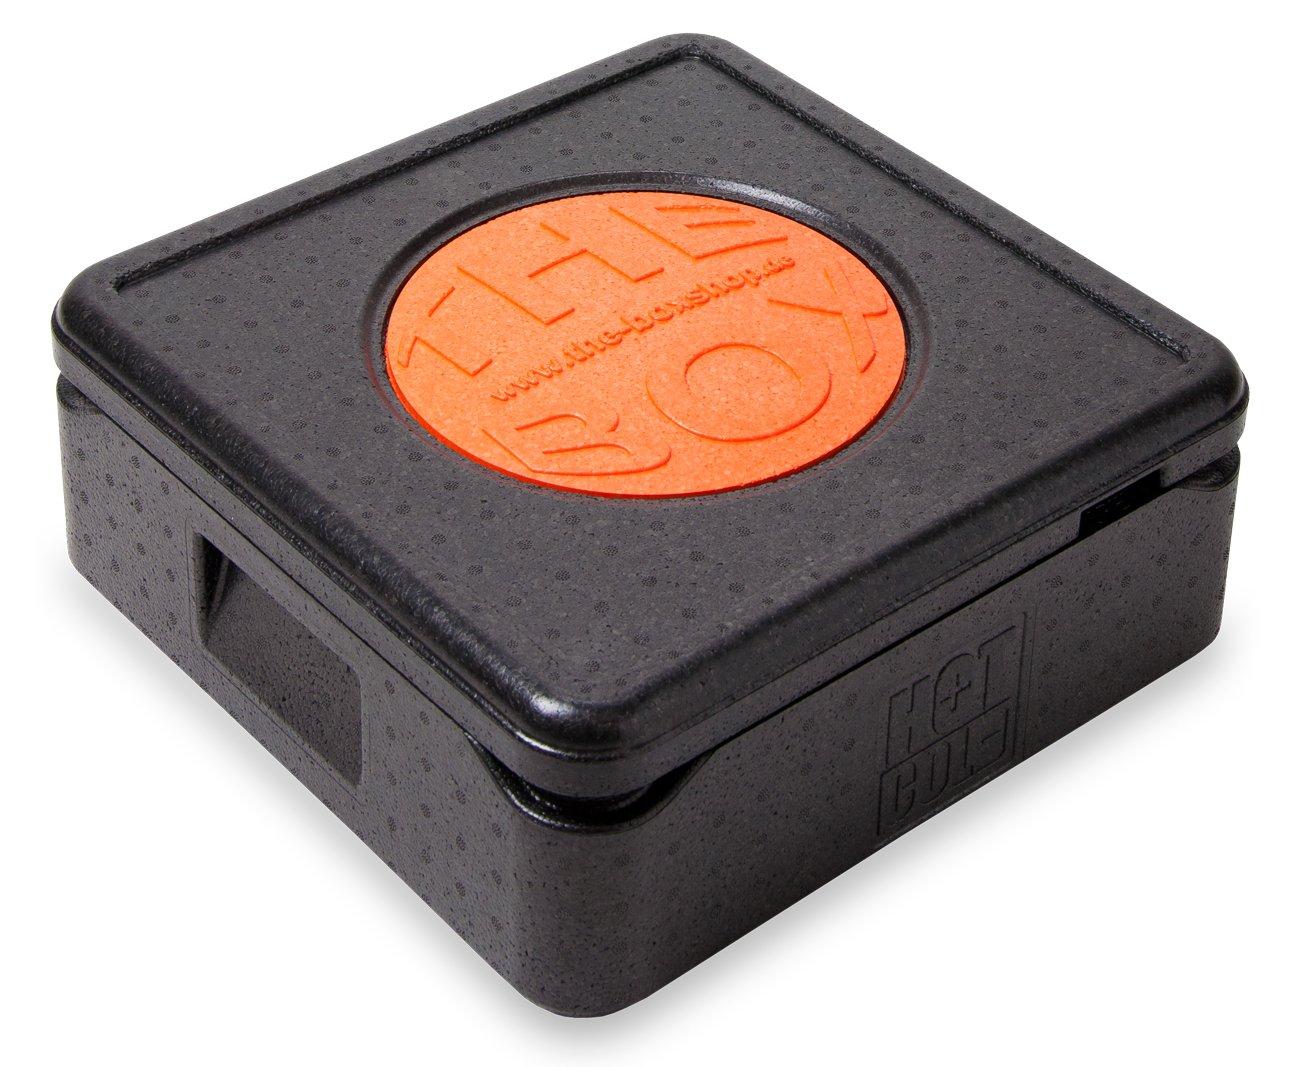 *4er Paket* - THE BOX Thermobox Pizza 79770; schwarz, Außenmaß 41 x 41 x 16,5 cm, Innenmaß 35 x 35 x 10 cm, Nutzhöhe 10 cm, 12 l.